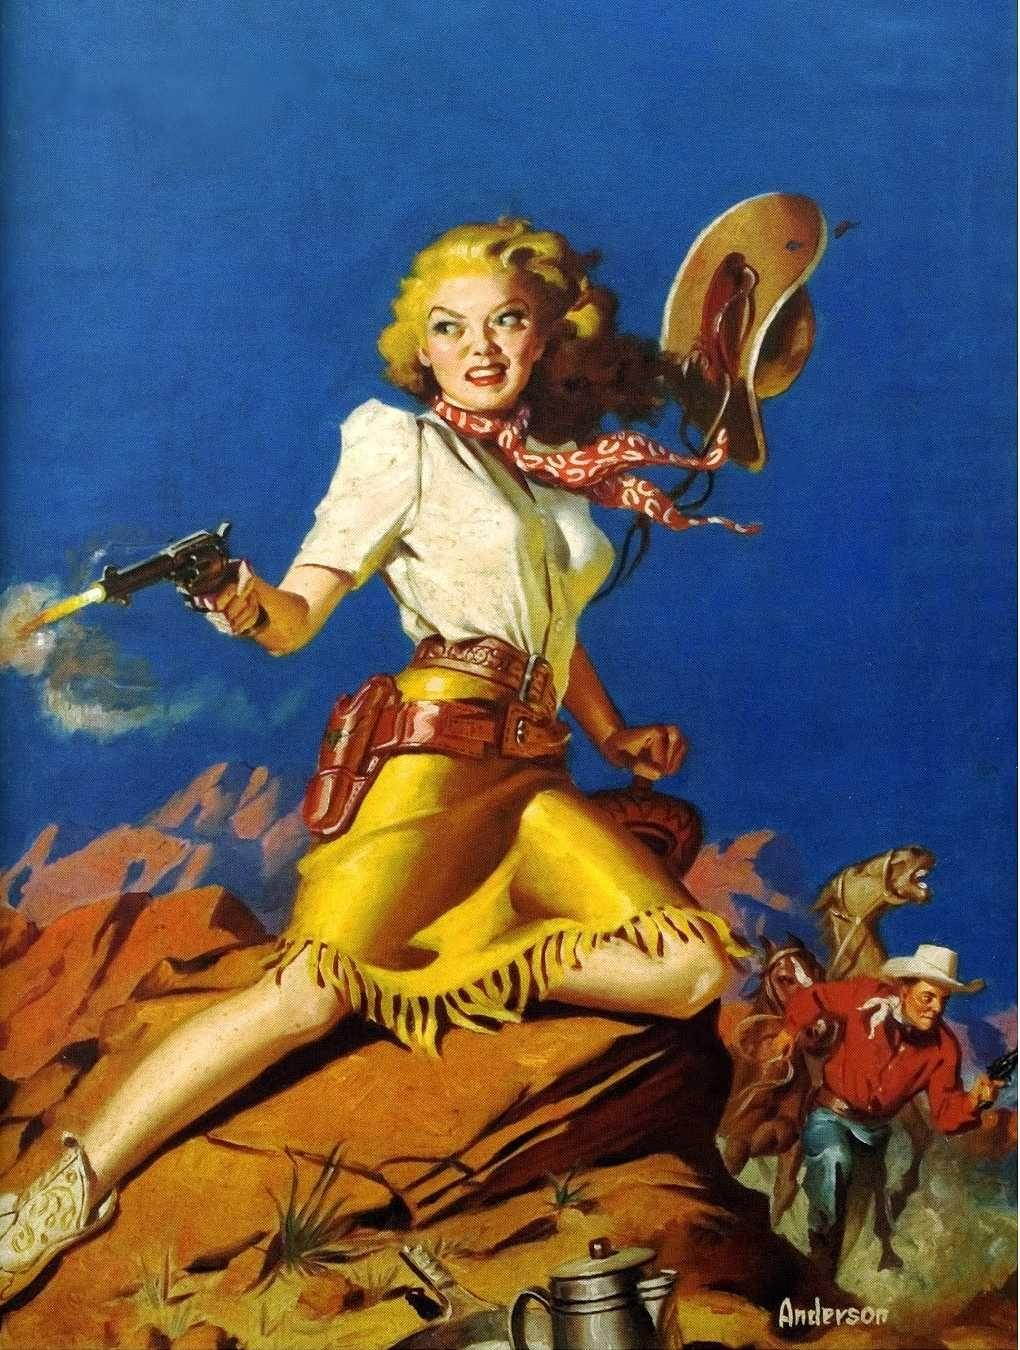 pulp art by Allen Anderson, western cowgirl woman girl dame pistol revolver  gun shot danger cowboy